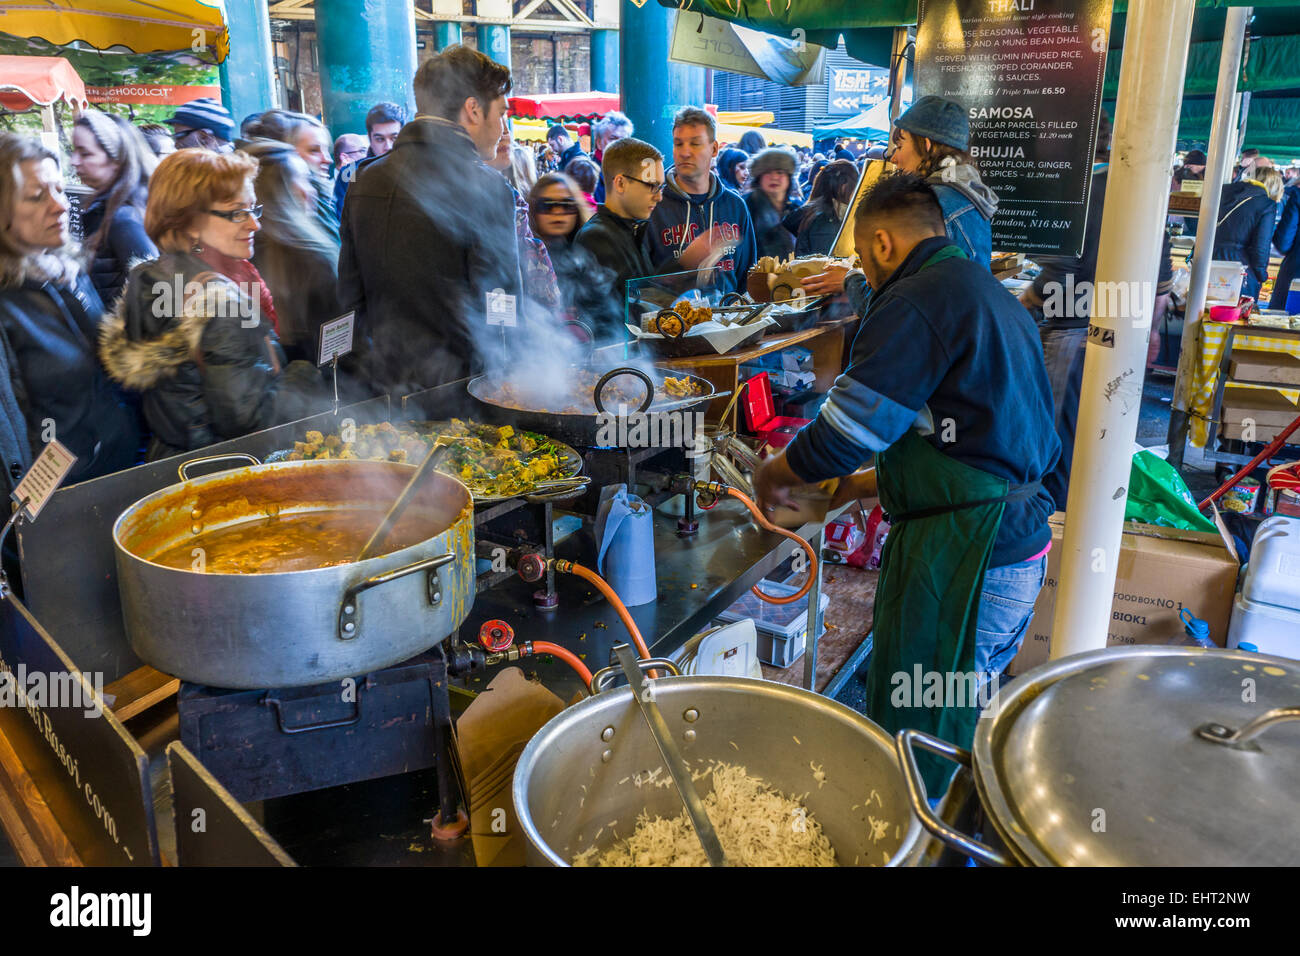 Borough Market Curry - Stock Image